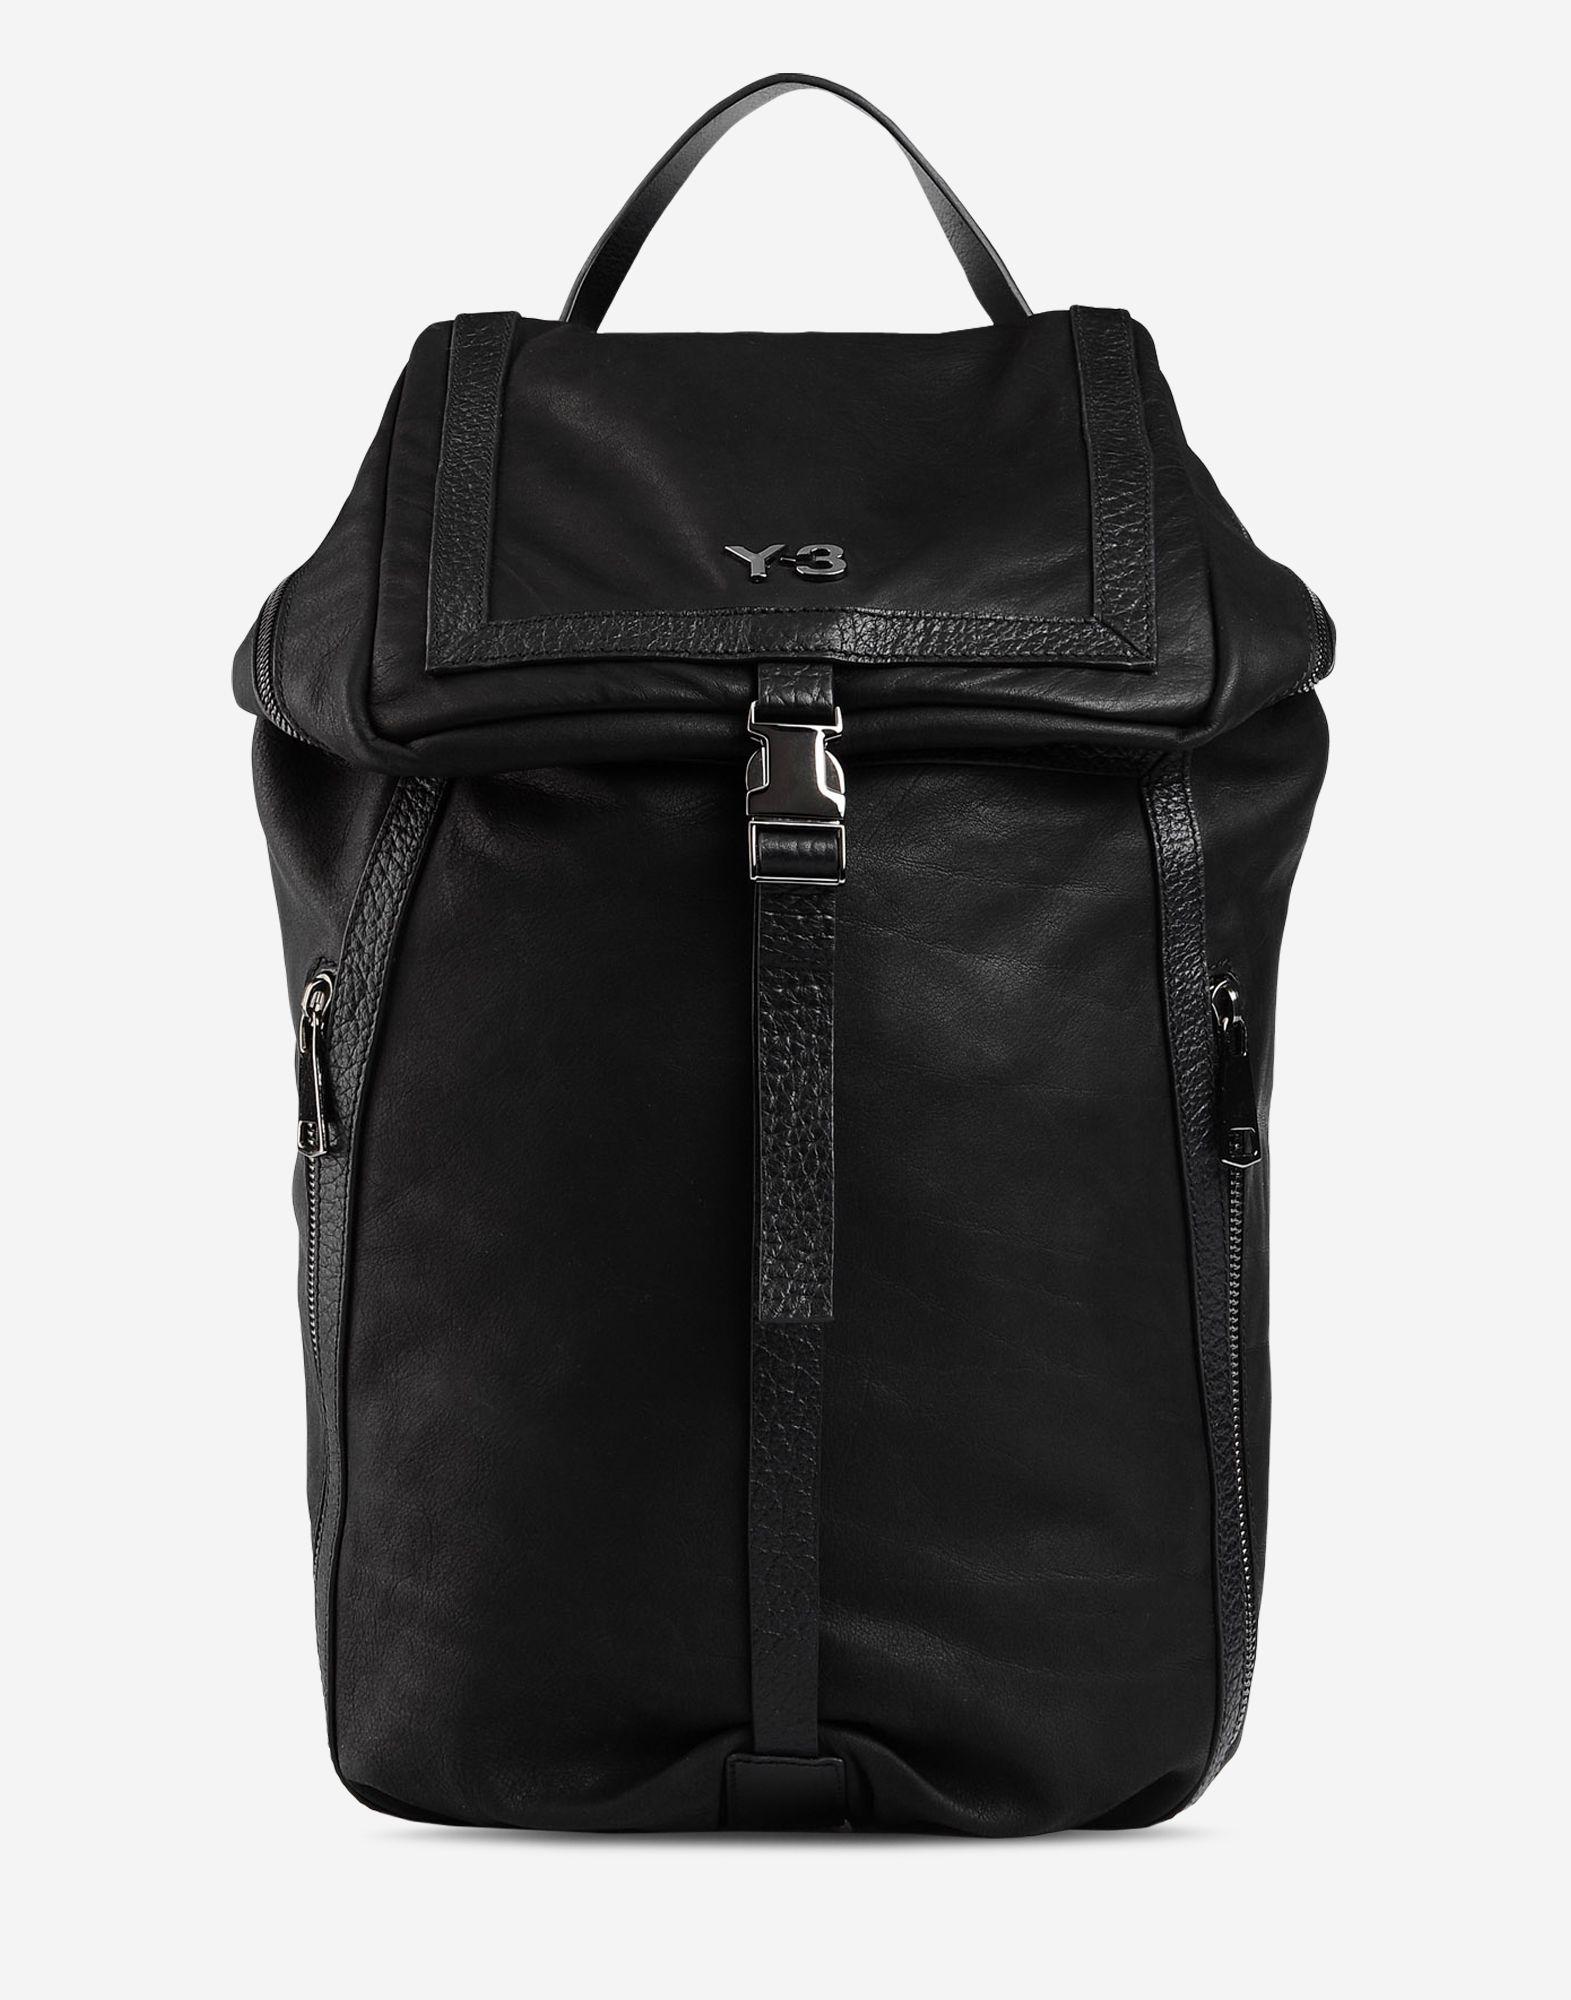 b2b300cc895 Y-3 Online Store -, Y-3 Toile Lthr Backpack   Bag   Backpack ...